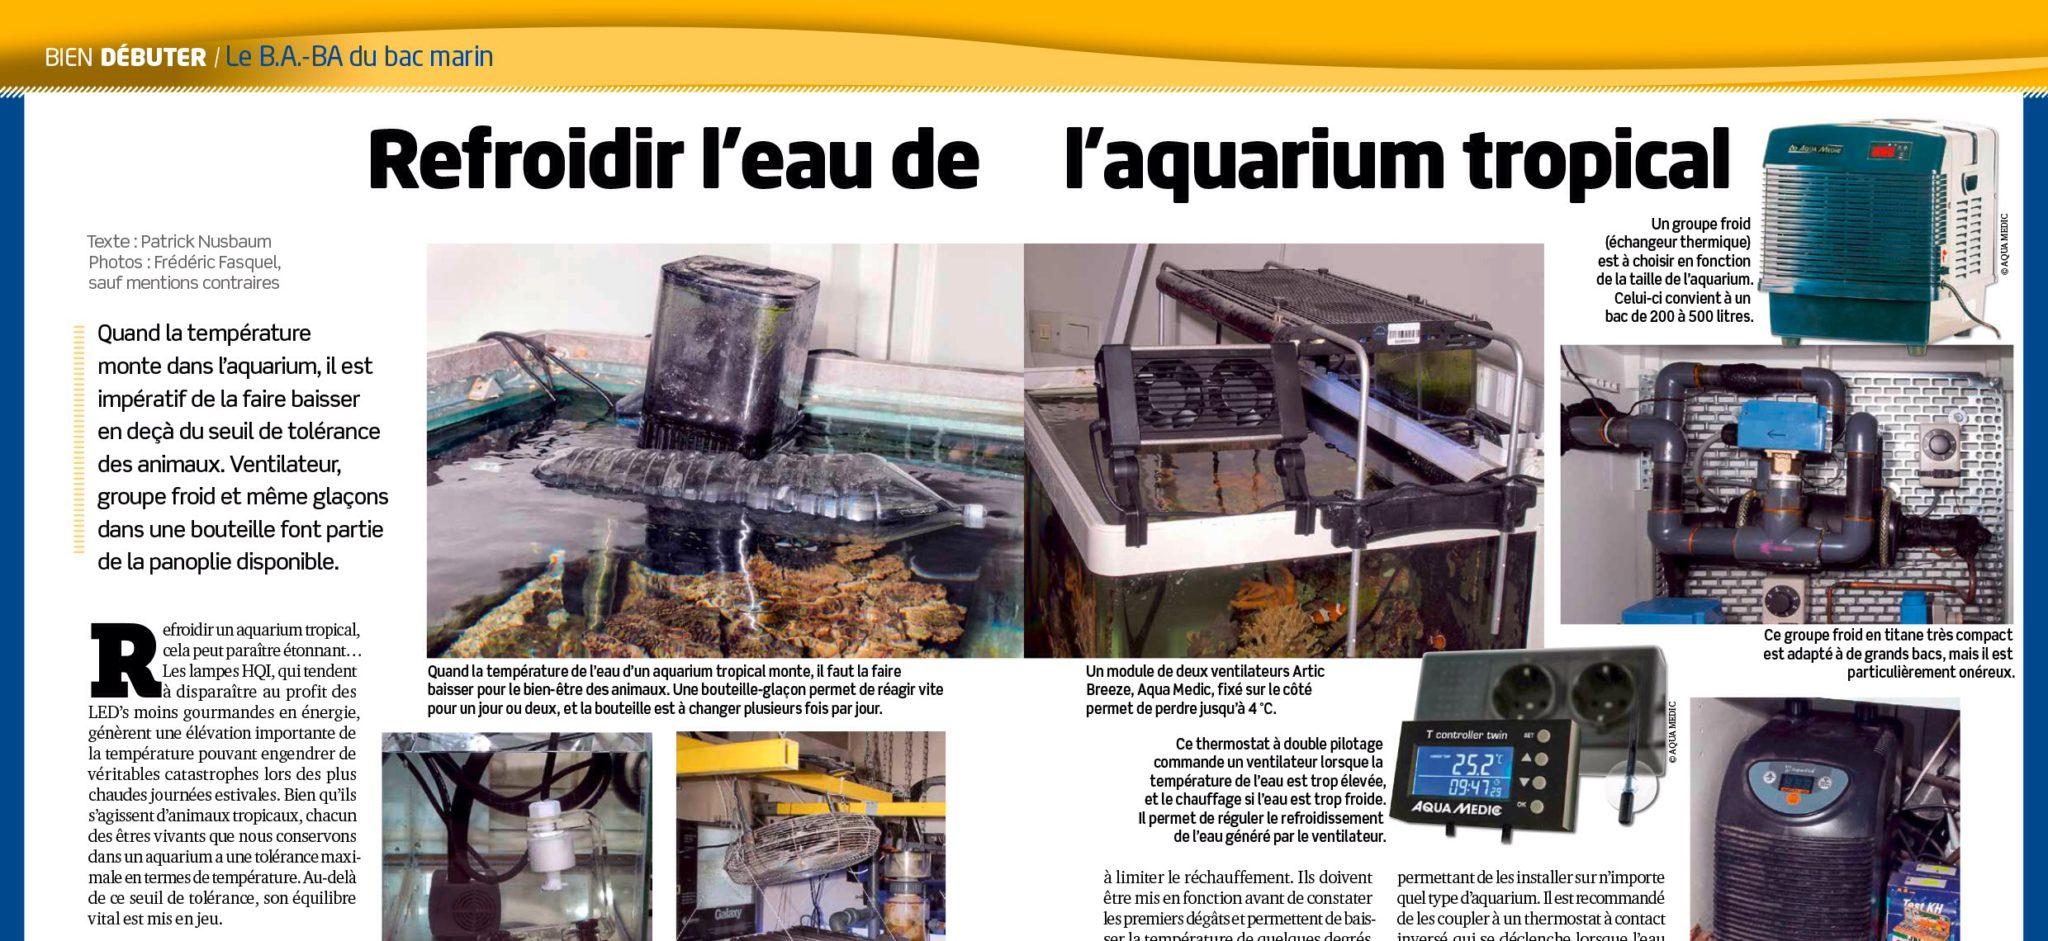 Aquarium la maison 122 refroidir son aquarium for Aquarium a la maison pdf